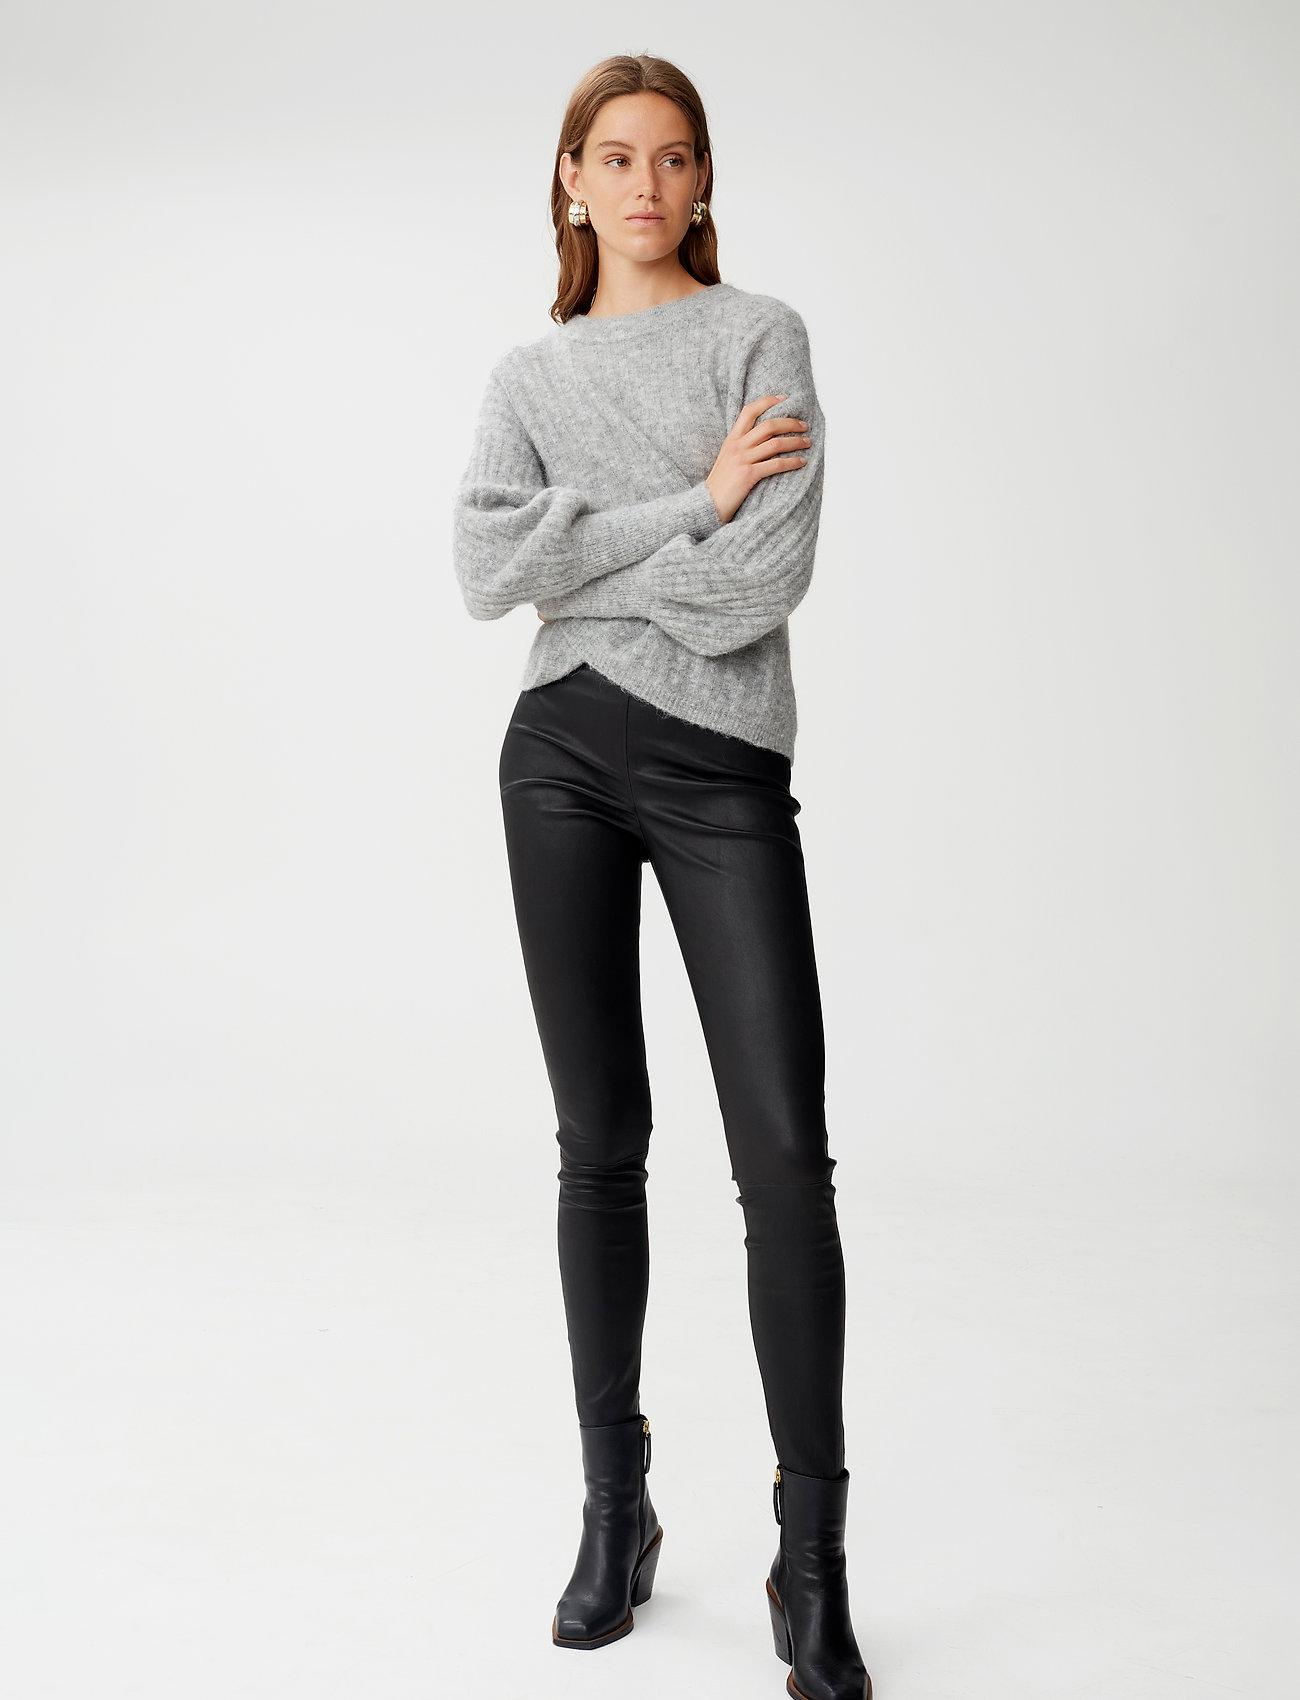 Gestuz - SashaGZ HW leather legging NOOS - læderbukser - black - 0